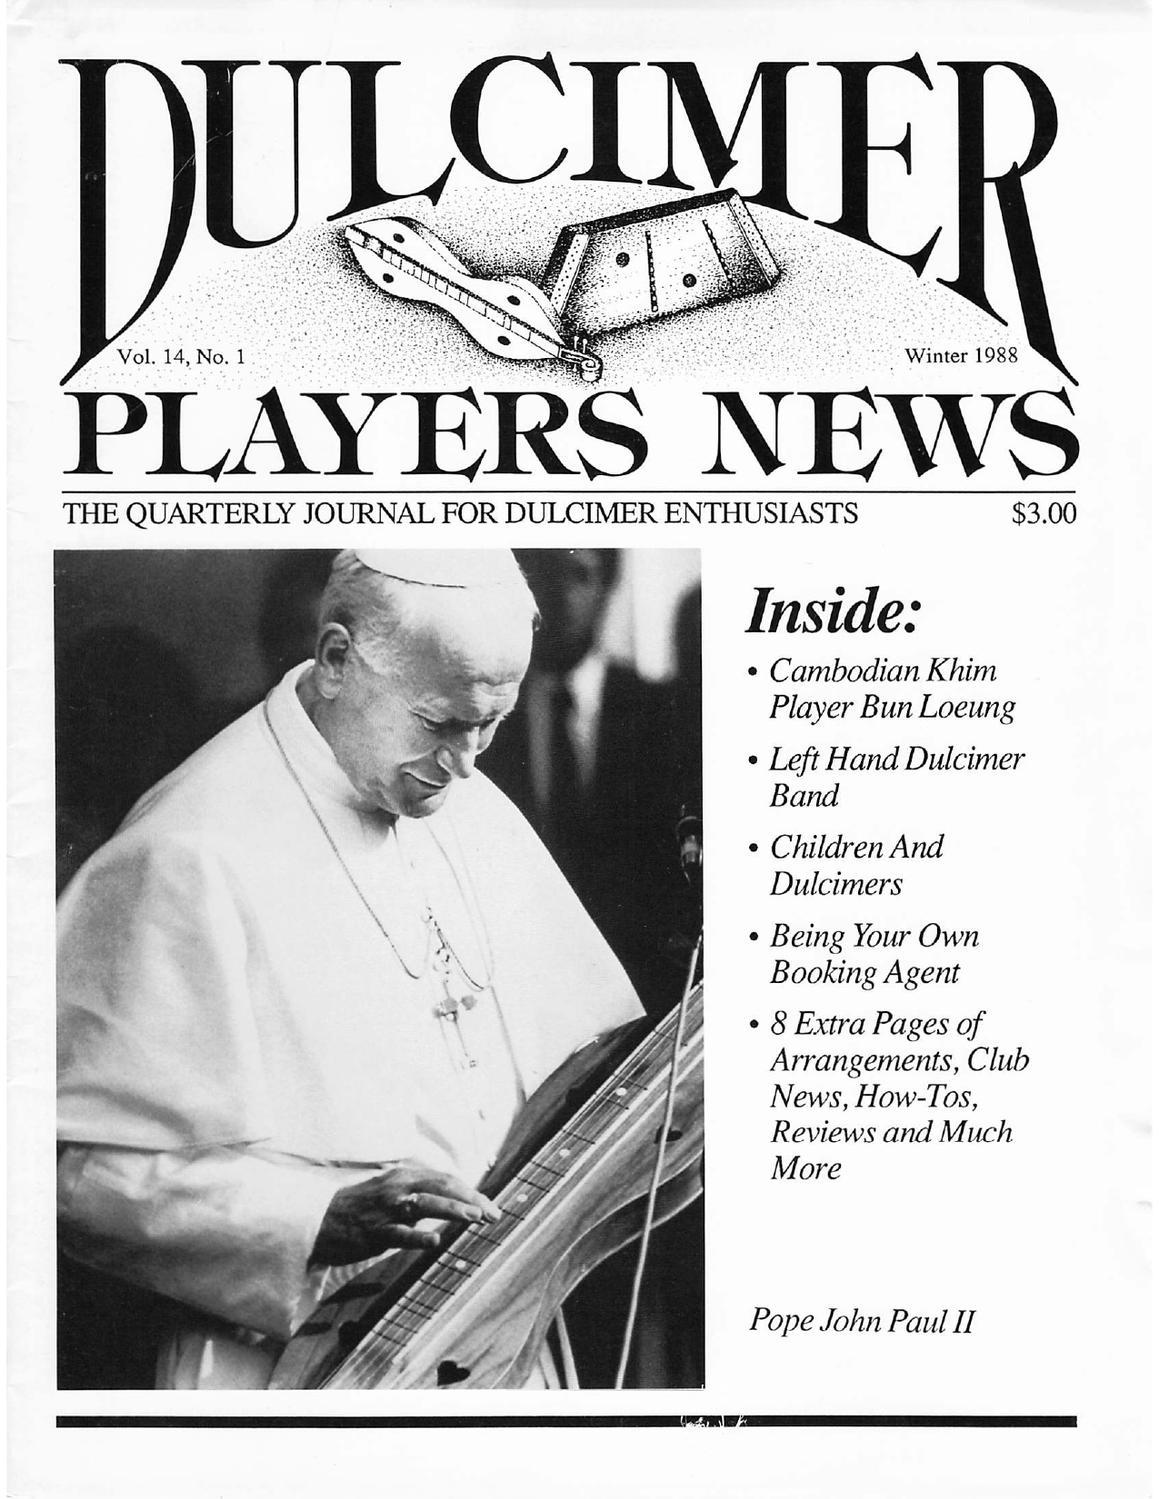 1988 01 dulcimer players news vol 14 no 1 by dulcimer players 2-Way Switch Wiring Diagram 1988 01 dulcimer players news vol 14 no 1 by dulcimer players news issuu